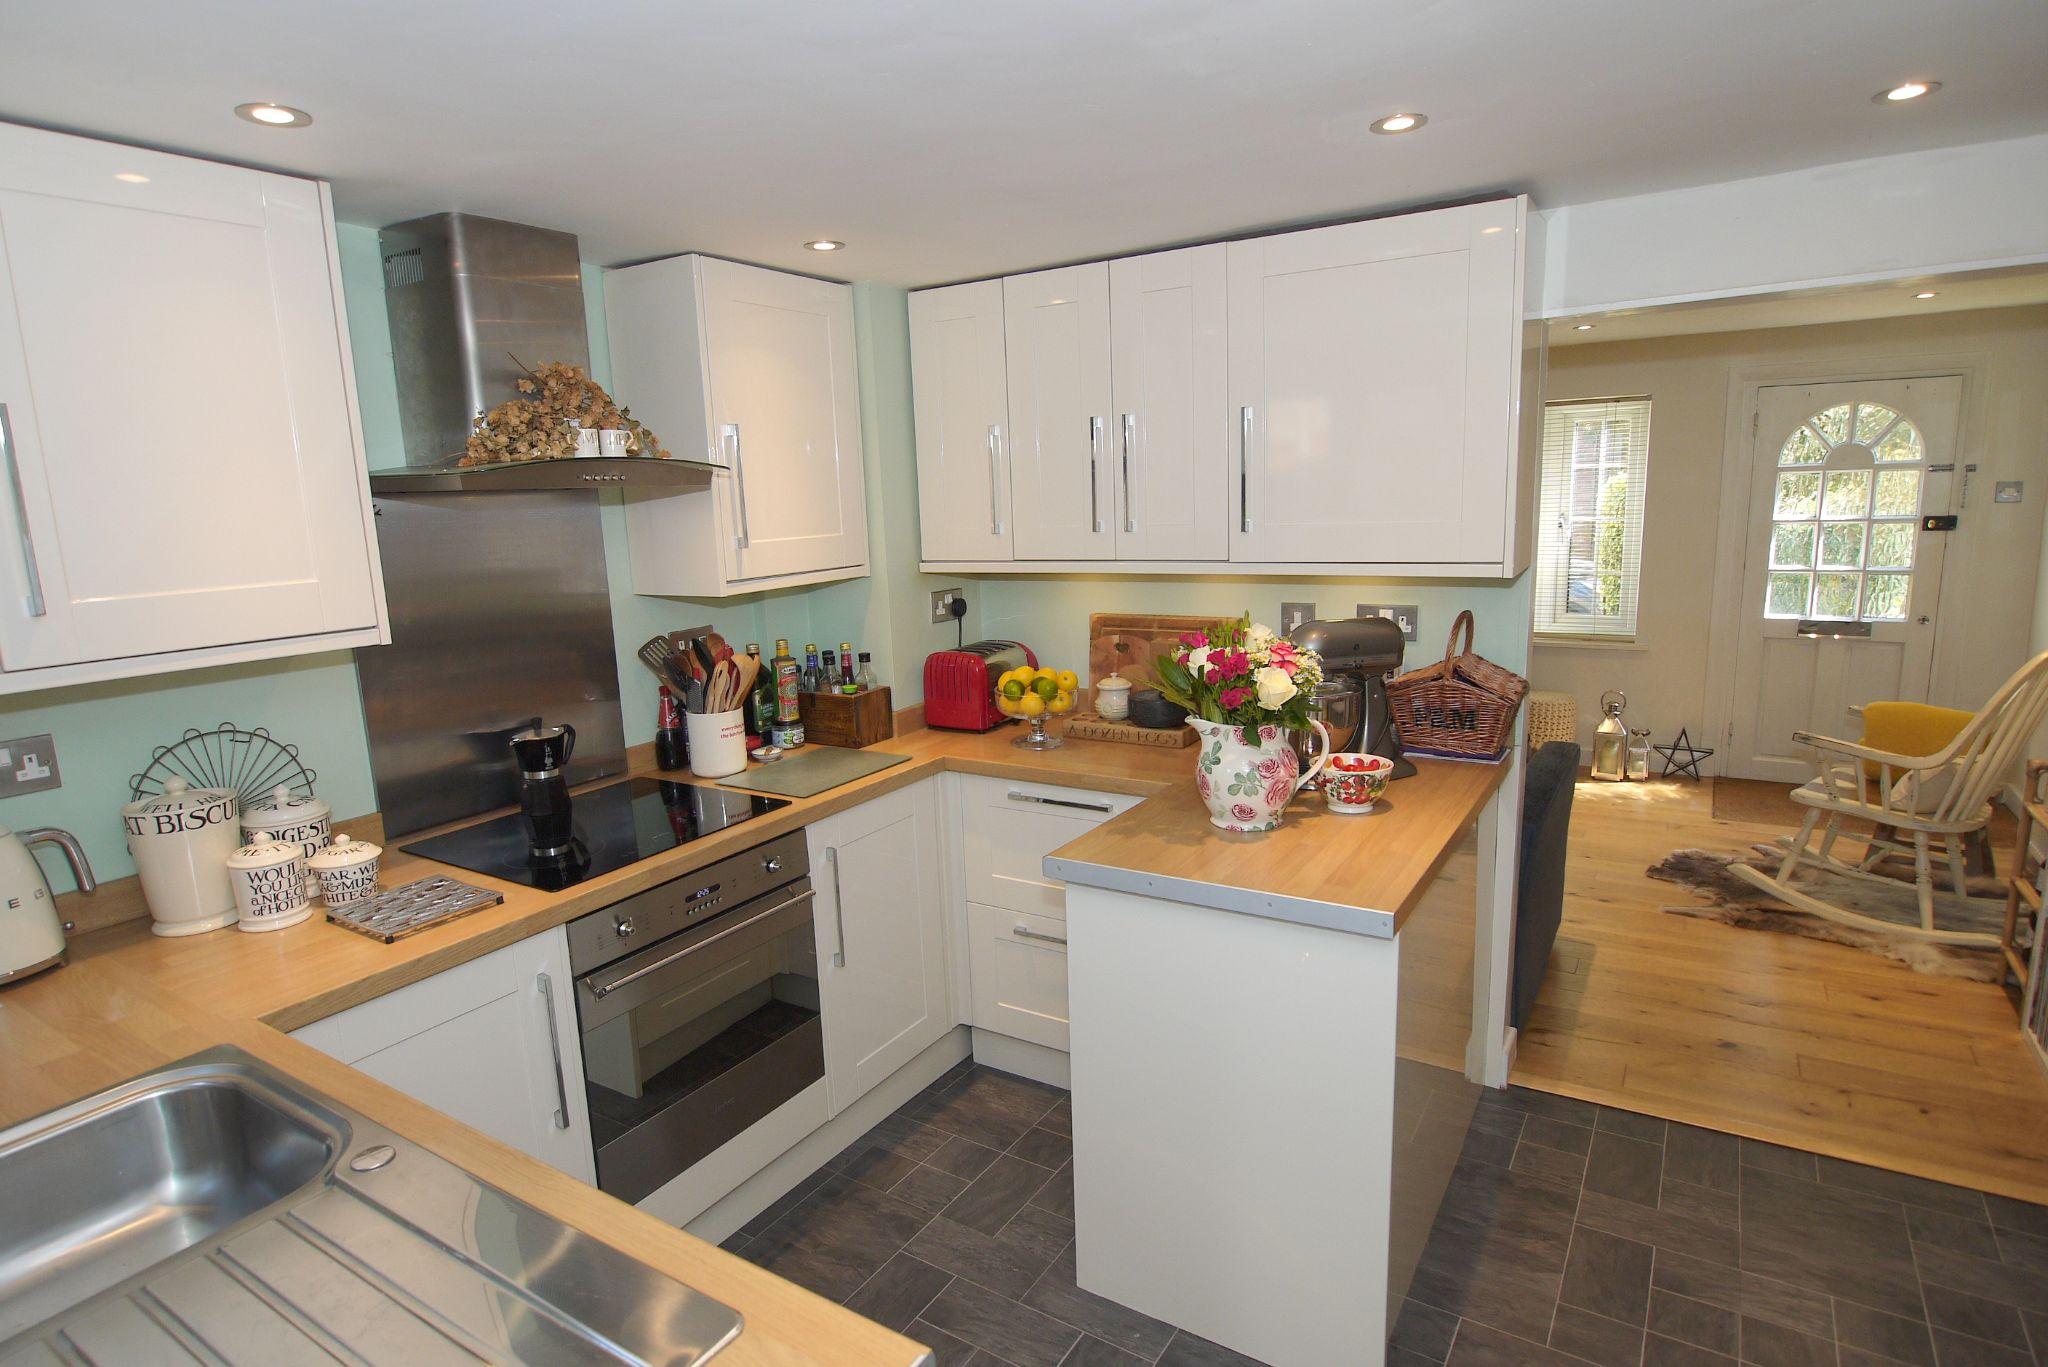 1 bedroom mid terraced house Sold in Sevenoaks - Photograph 3